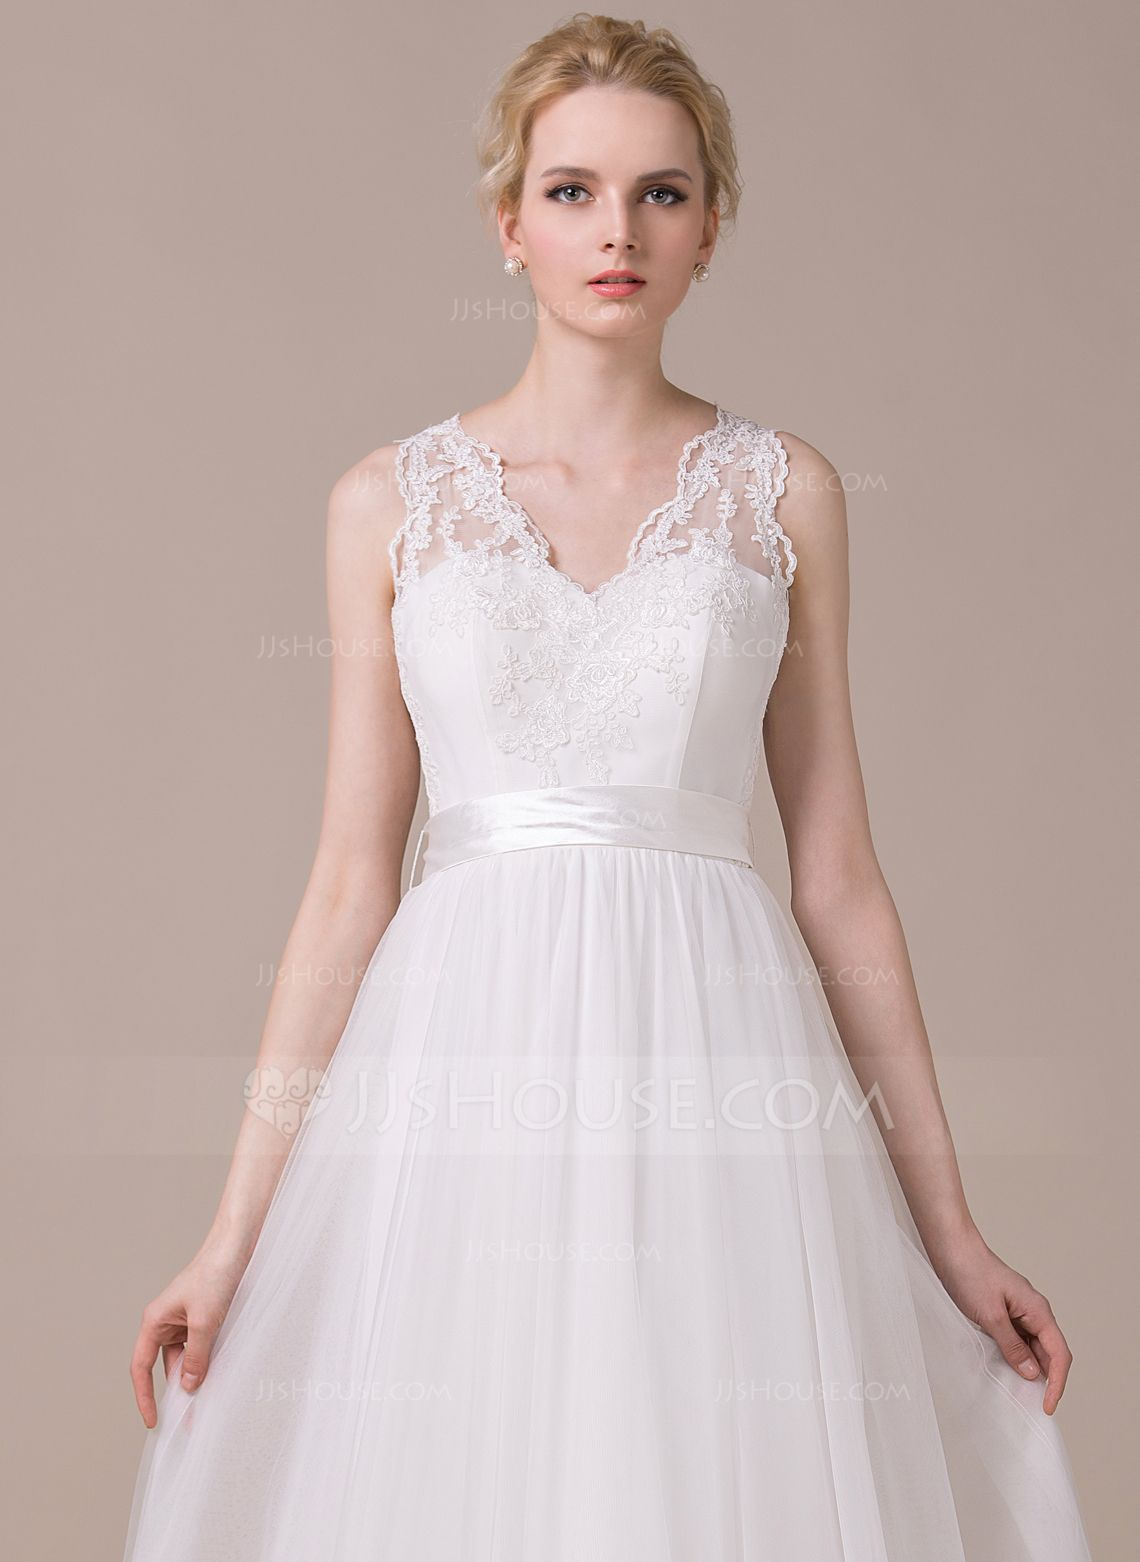 Alineprincess vneck sweep train tulle wedding dress with